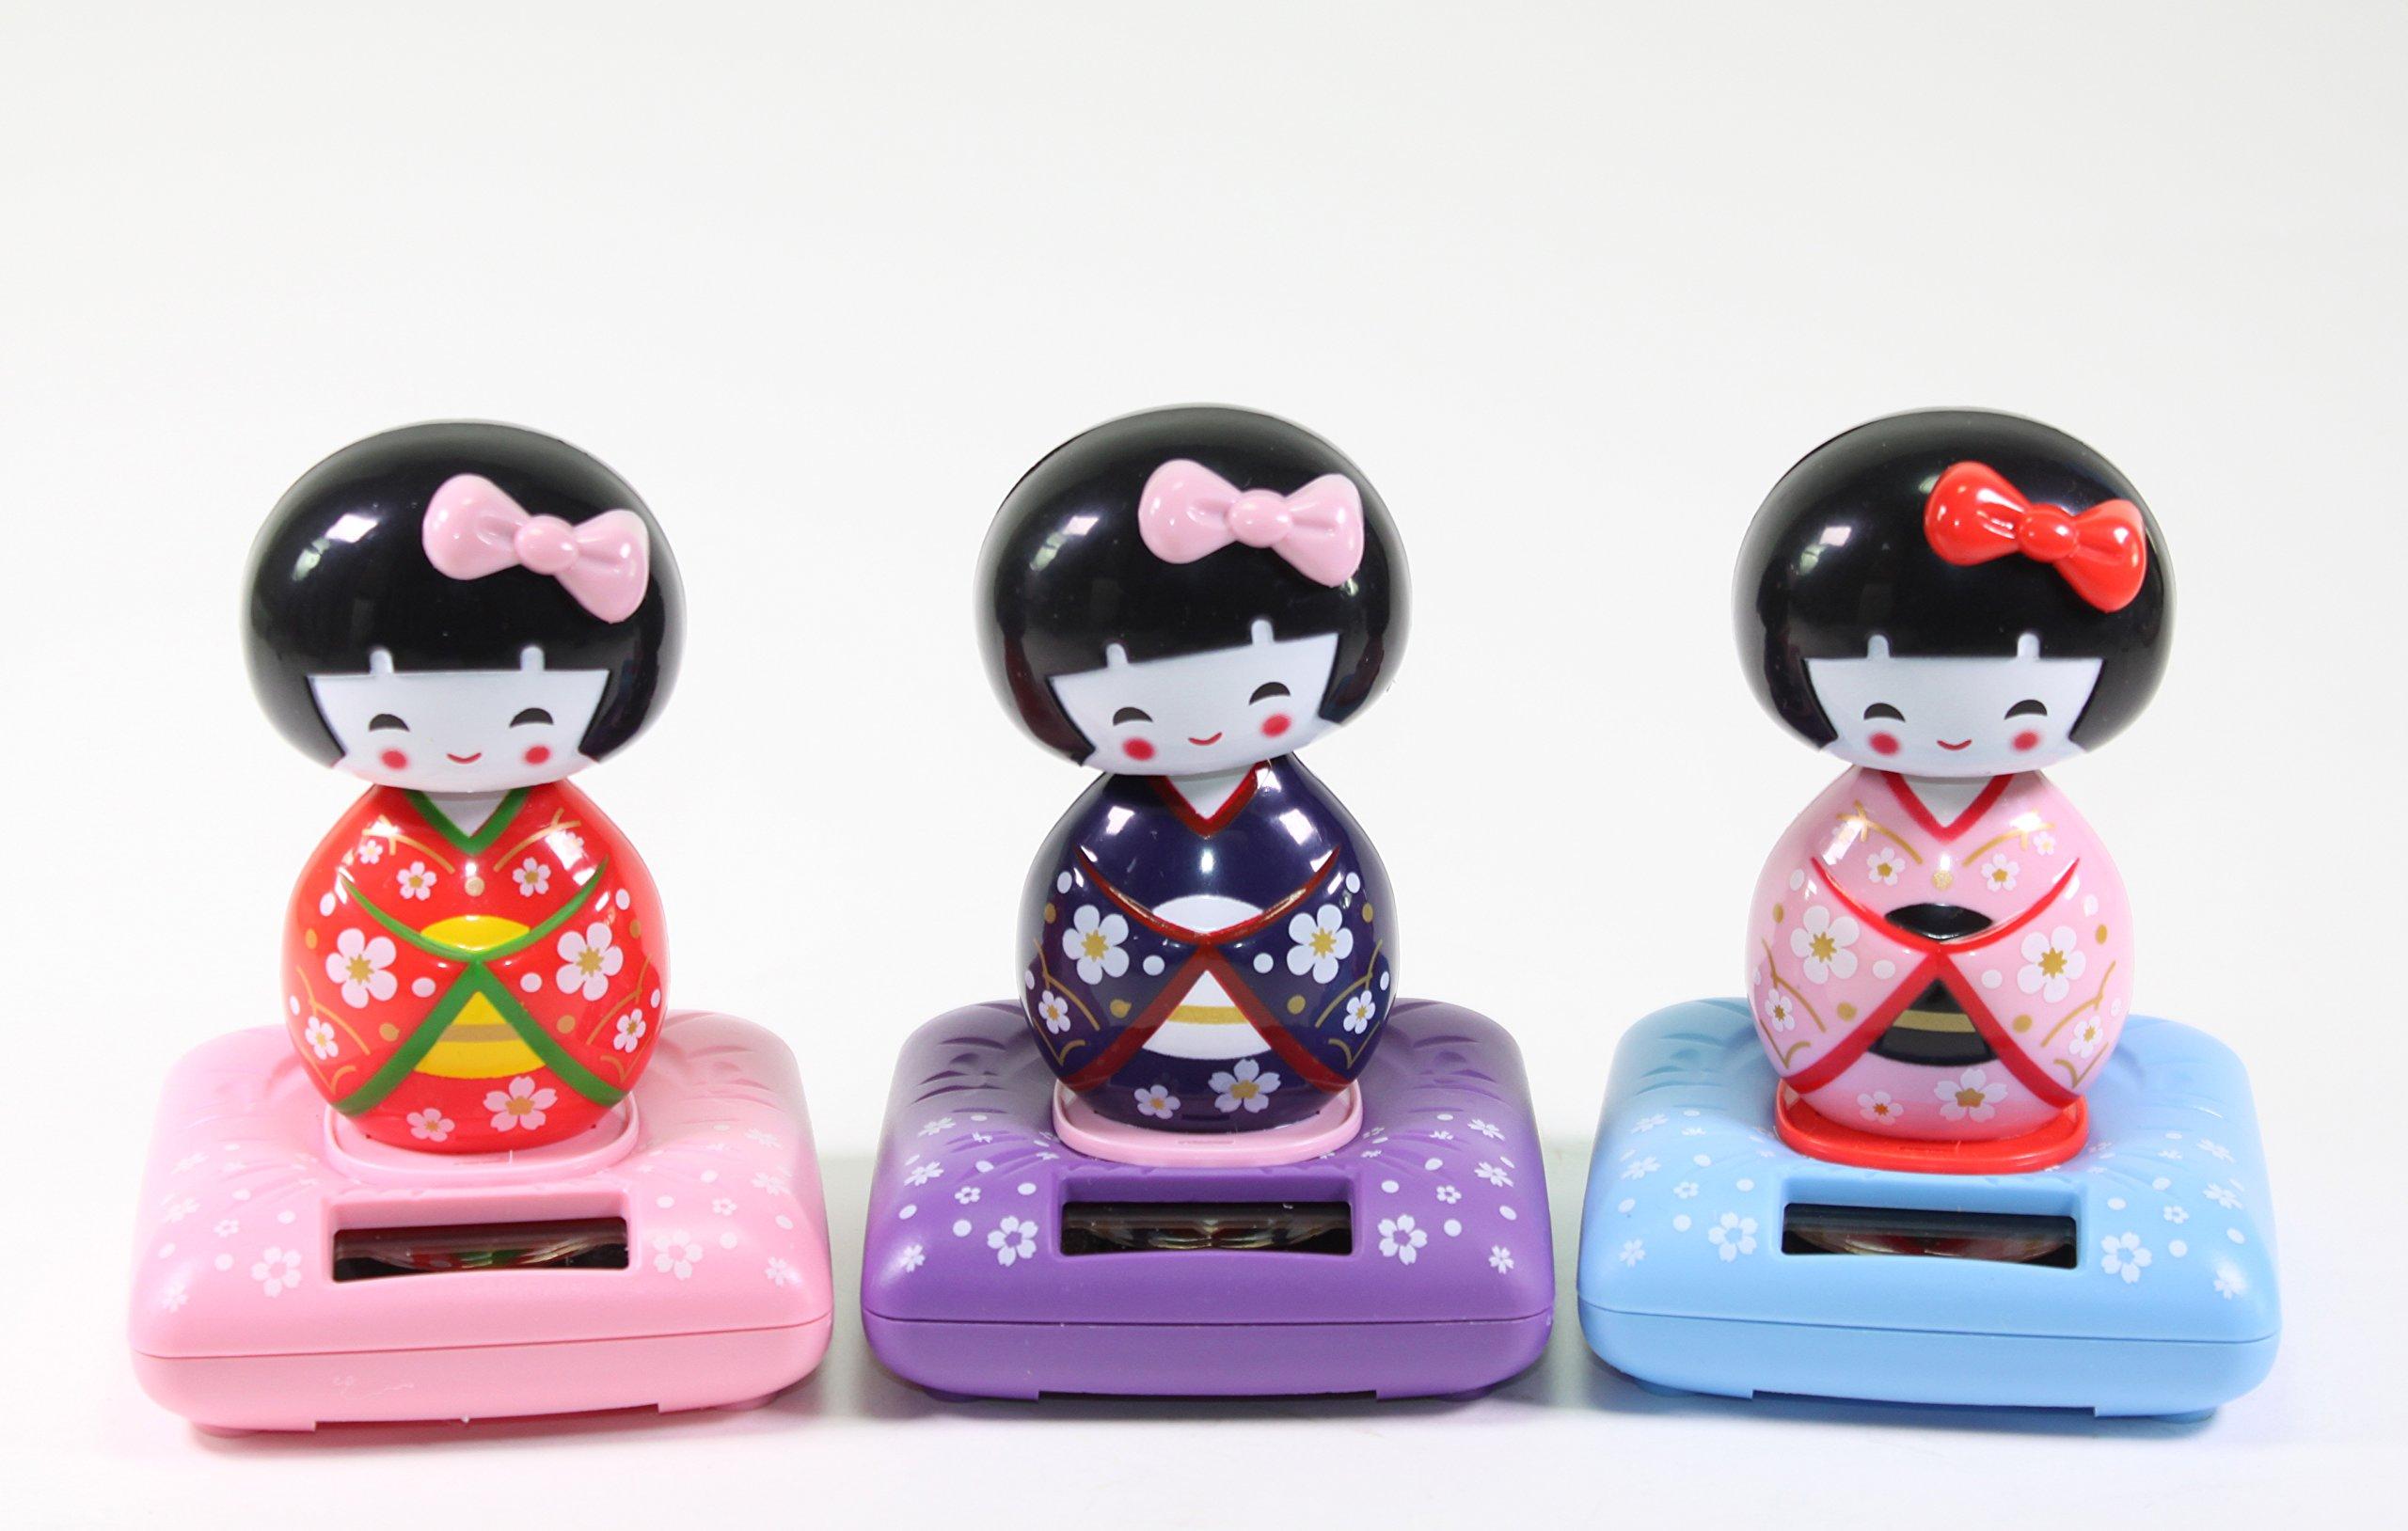 Solar Power TOY - Red-Pink-Purple- Kimono Cute Geisha Japanese Girl Car Home Decor